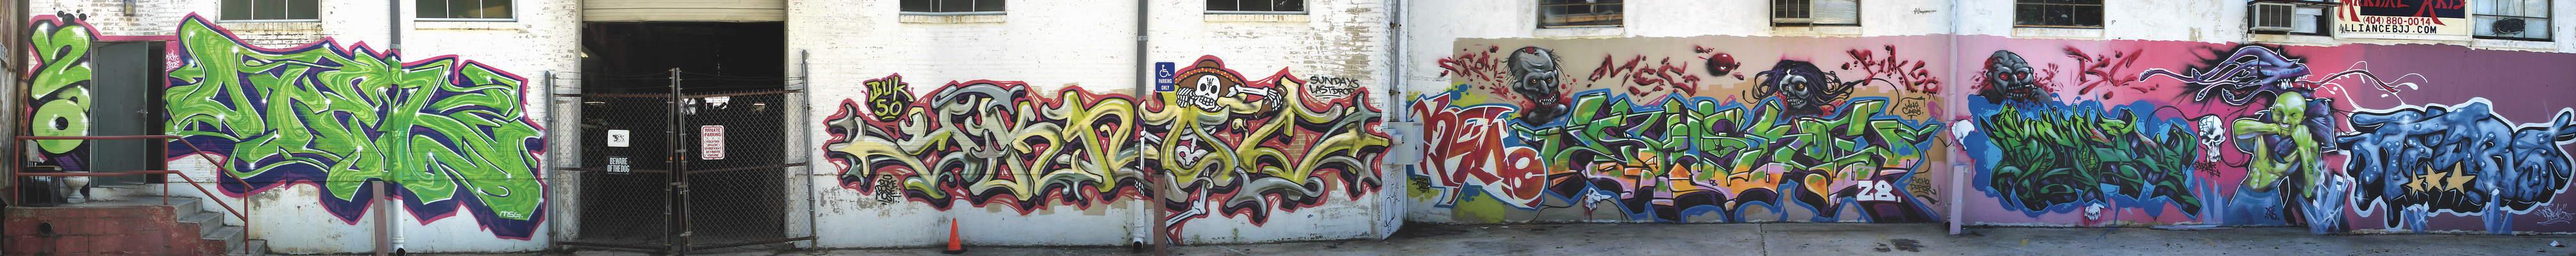 Art Crimes: Atlanta 38 Pictures Of Corrections